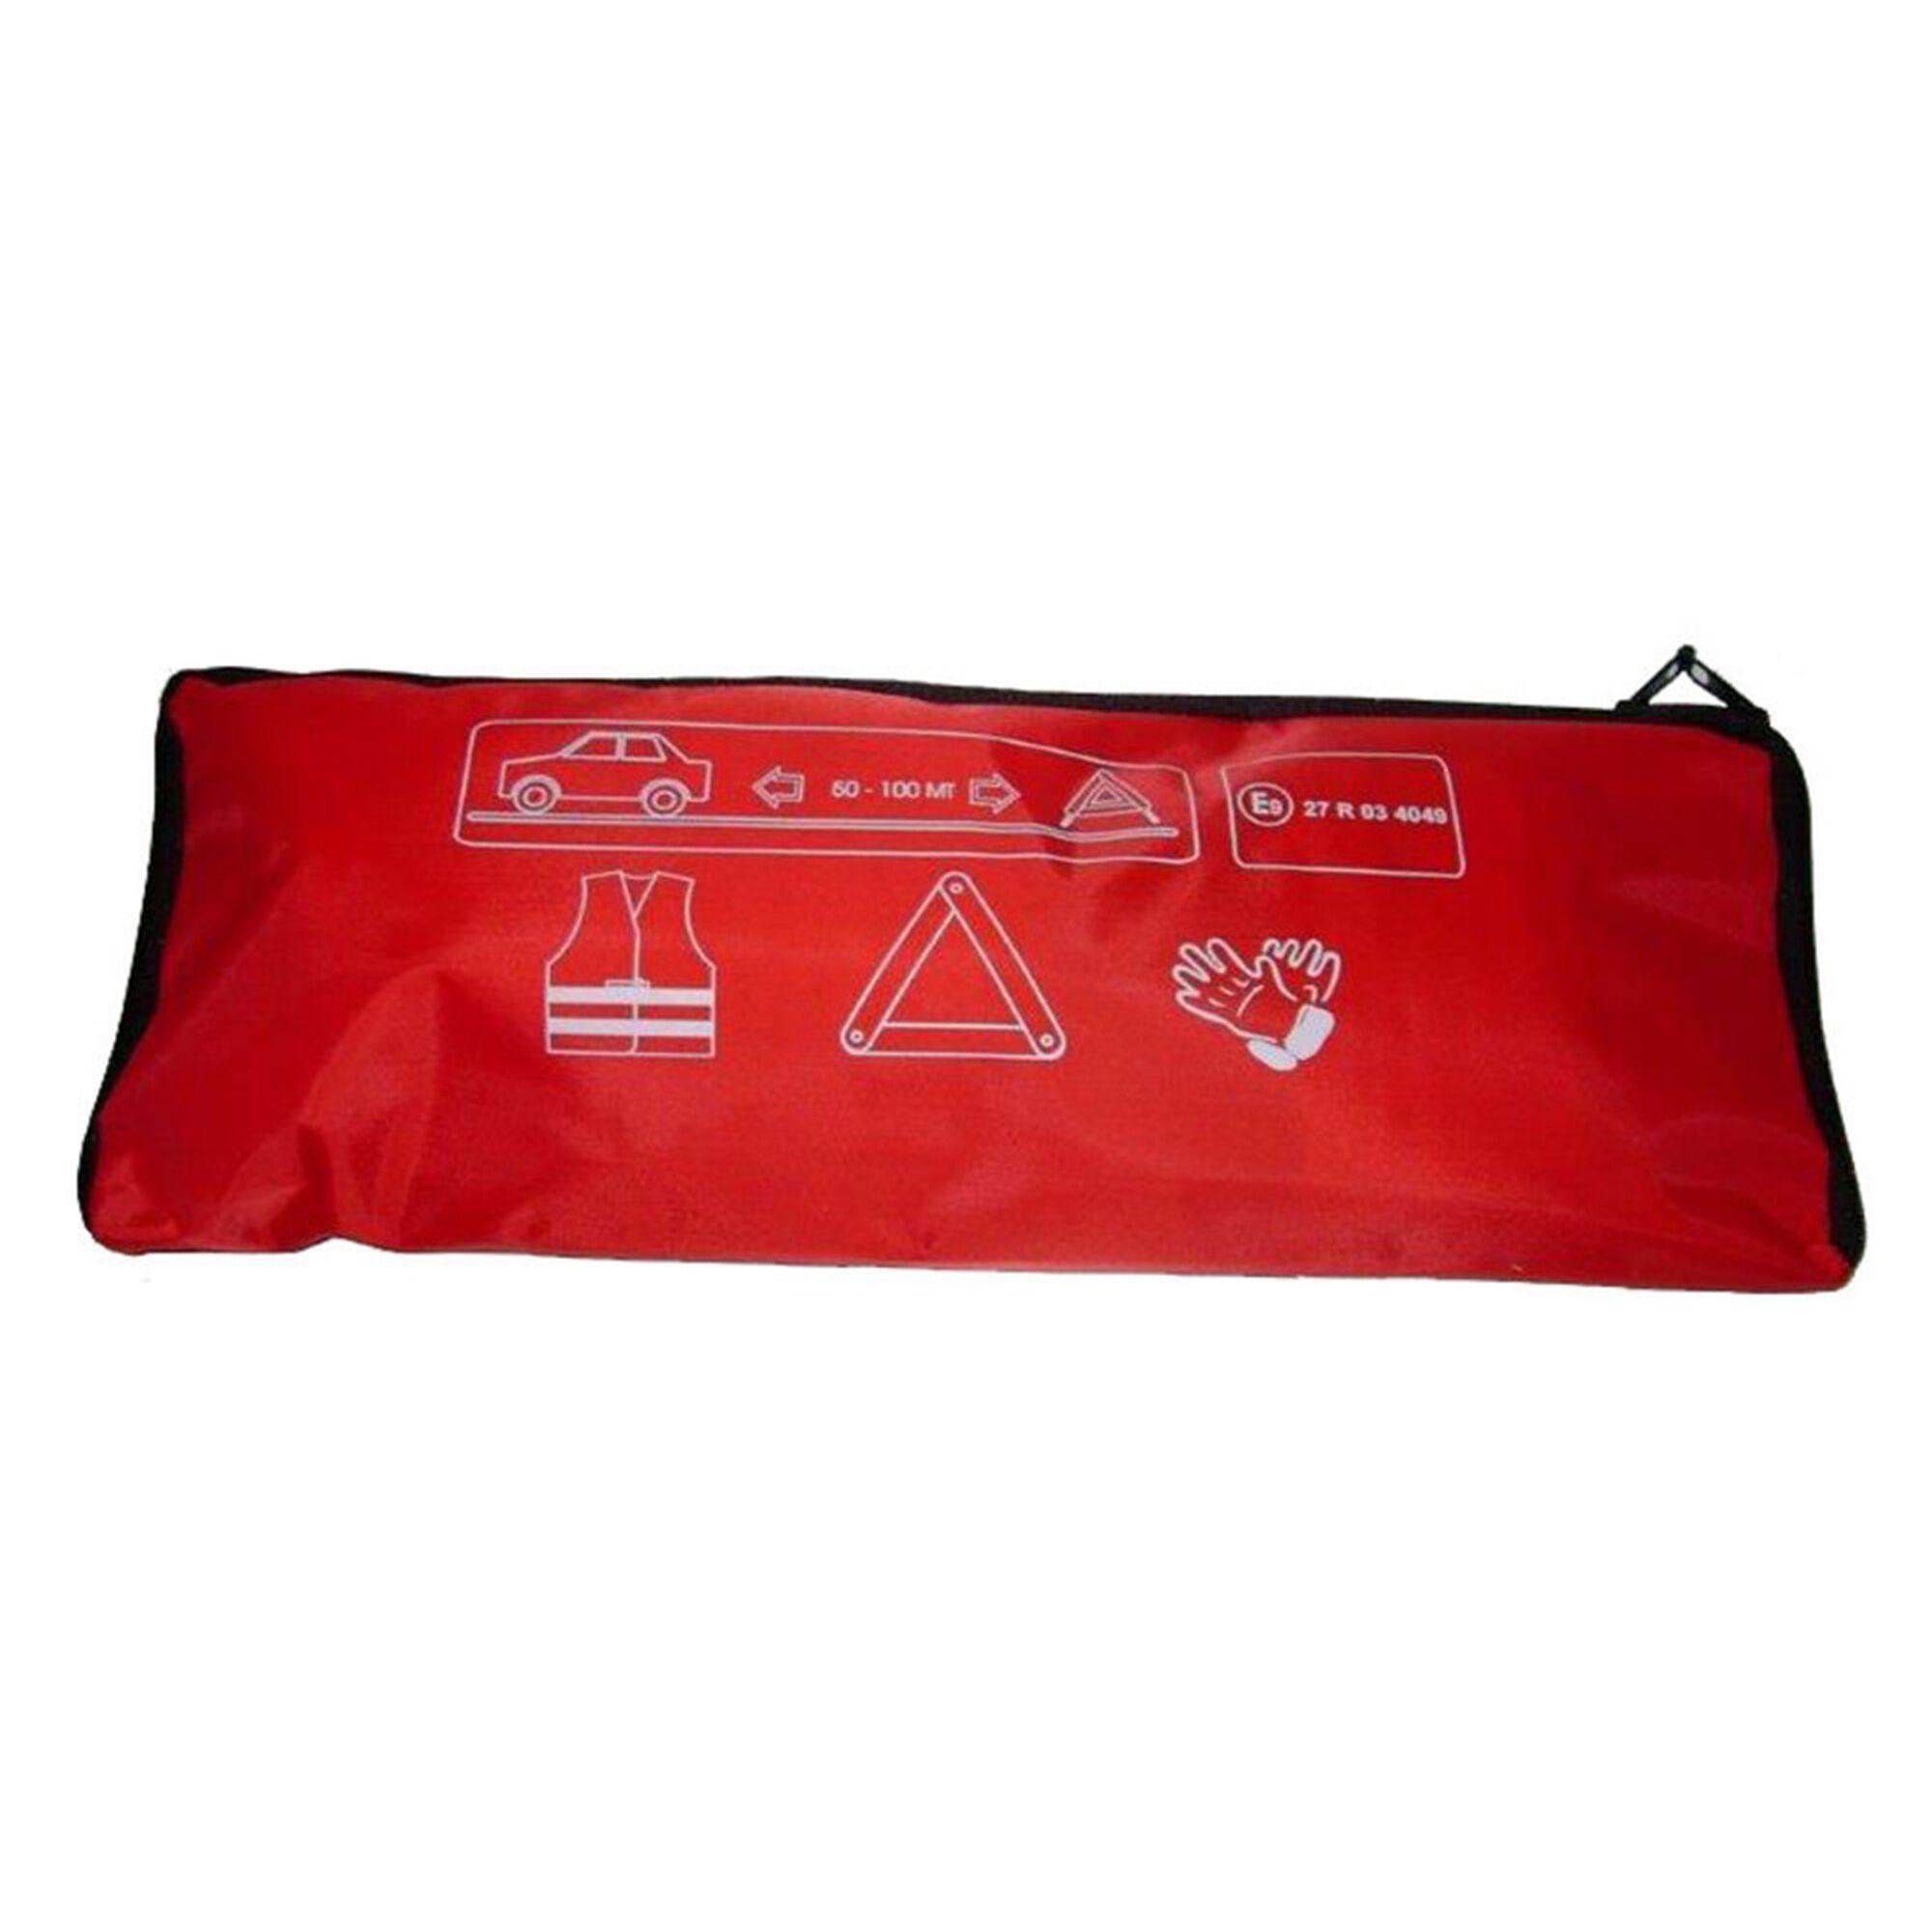 Conjunto Colete, Luvas e Triângulo Emergência